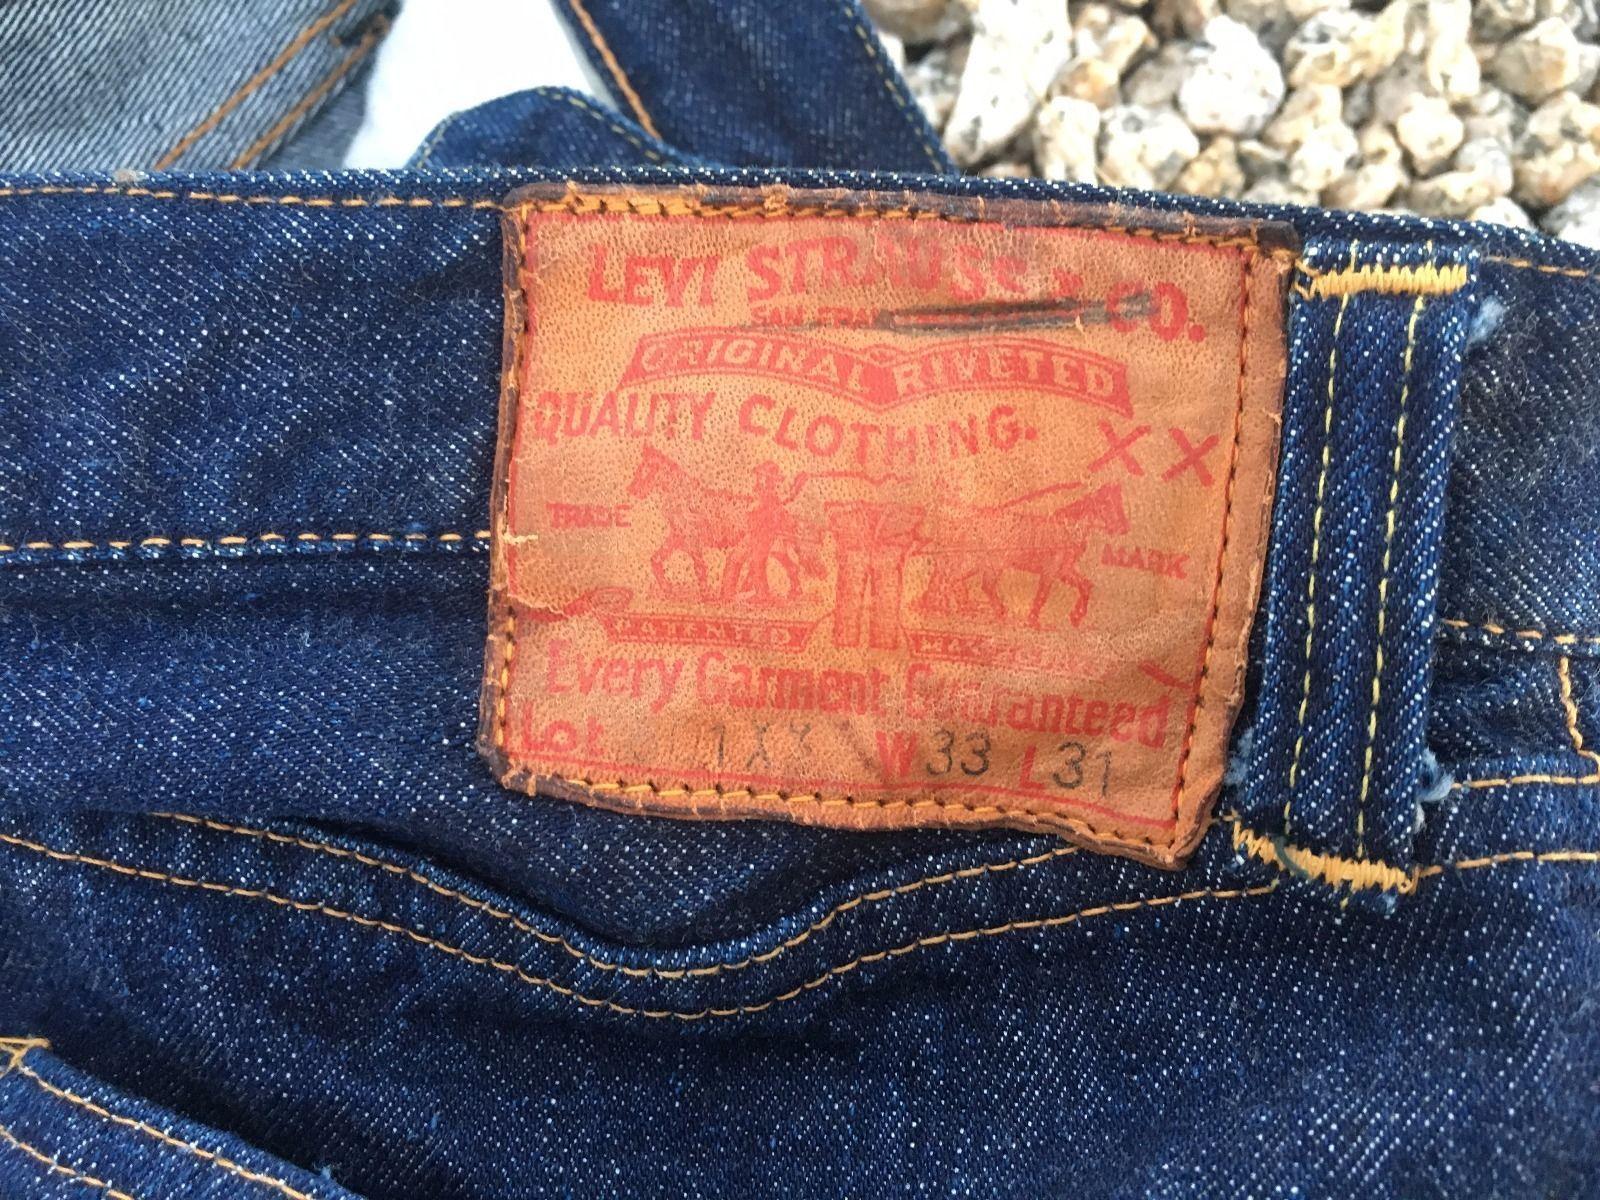 9d8fcfd97fe Vintage Levi Big E Redline Jerky Tag 501 XX Denim Jeans Hidden Rivets 40's  50'S | eBay